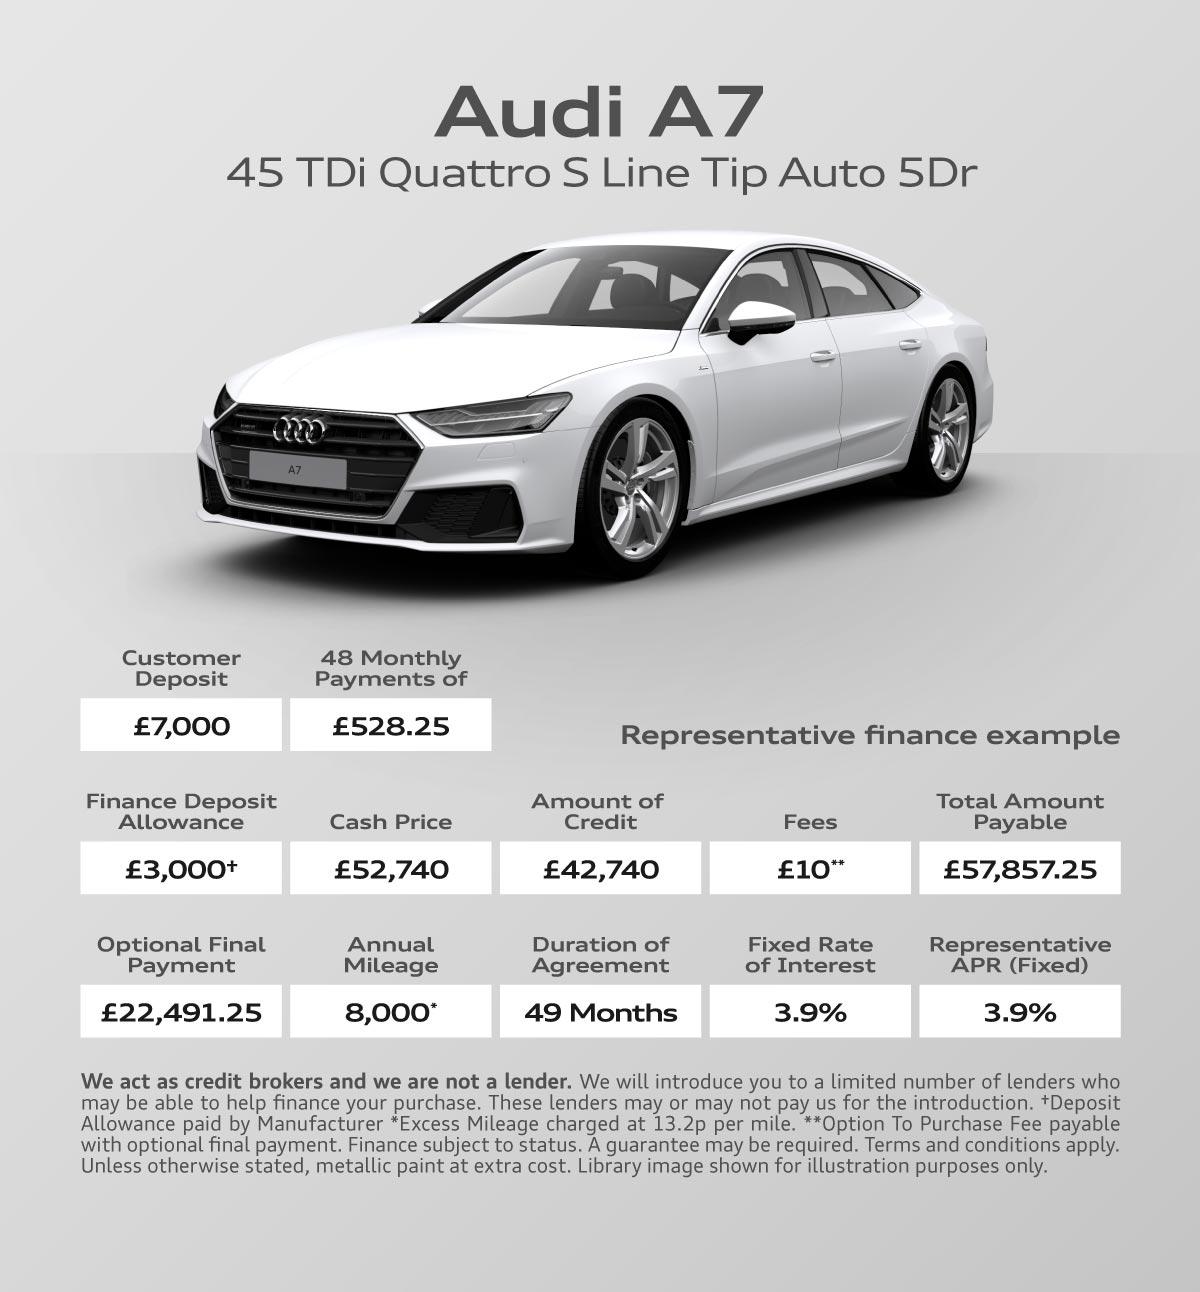 New Audi A7 VORSPRUNG Cars For Sale